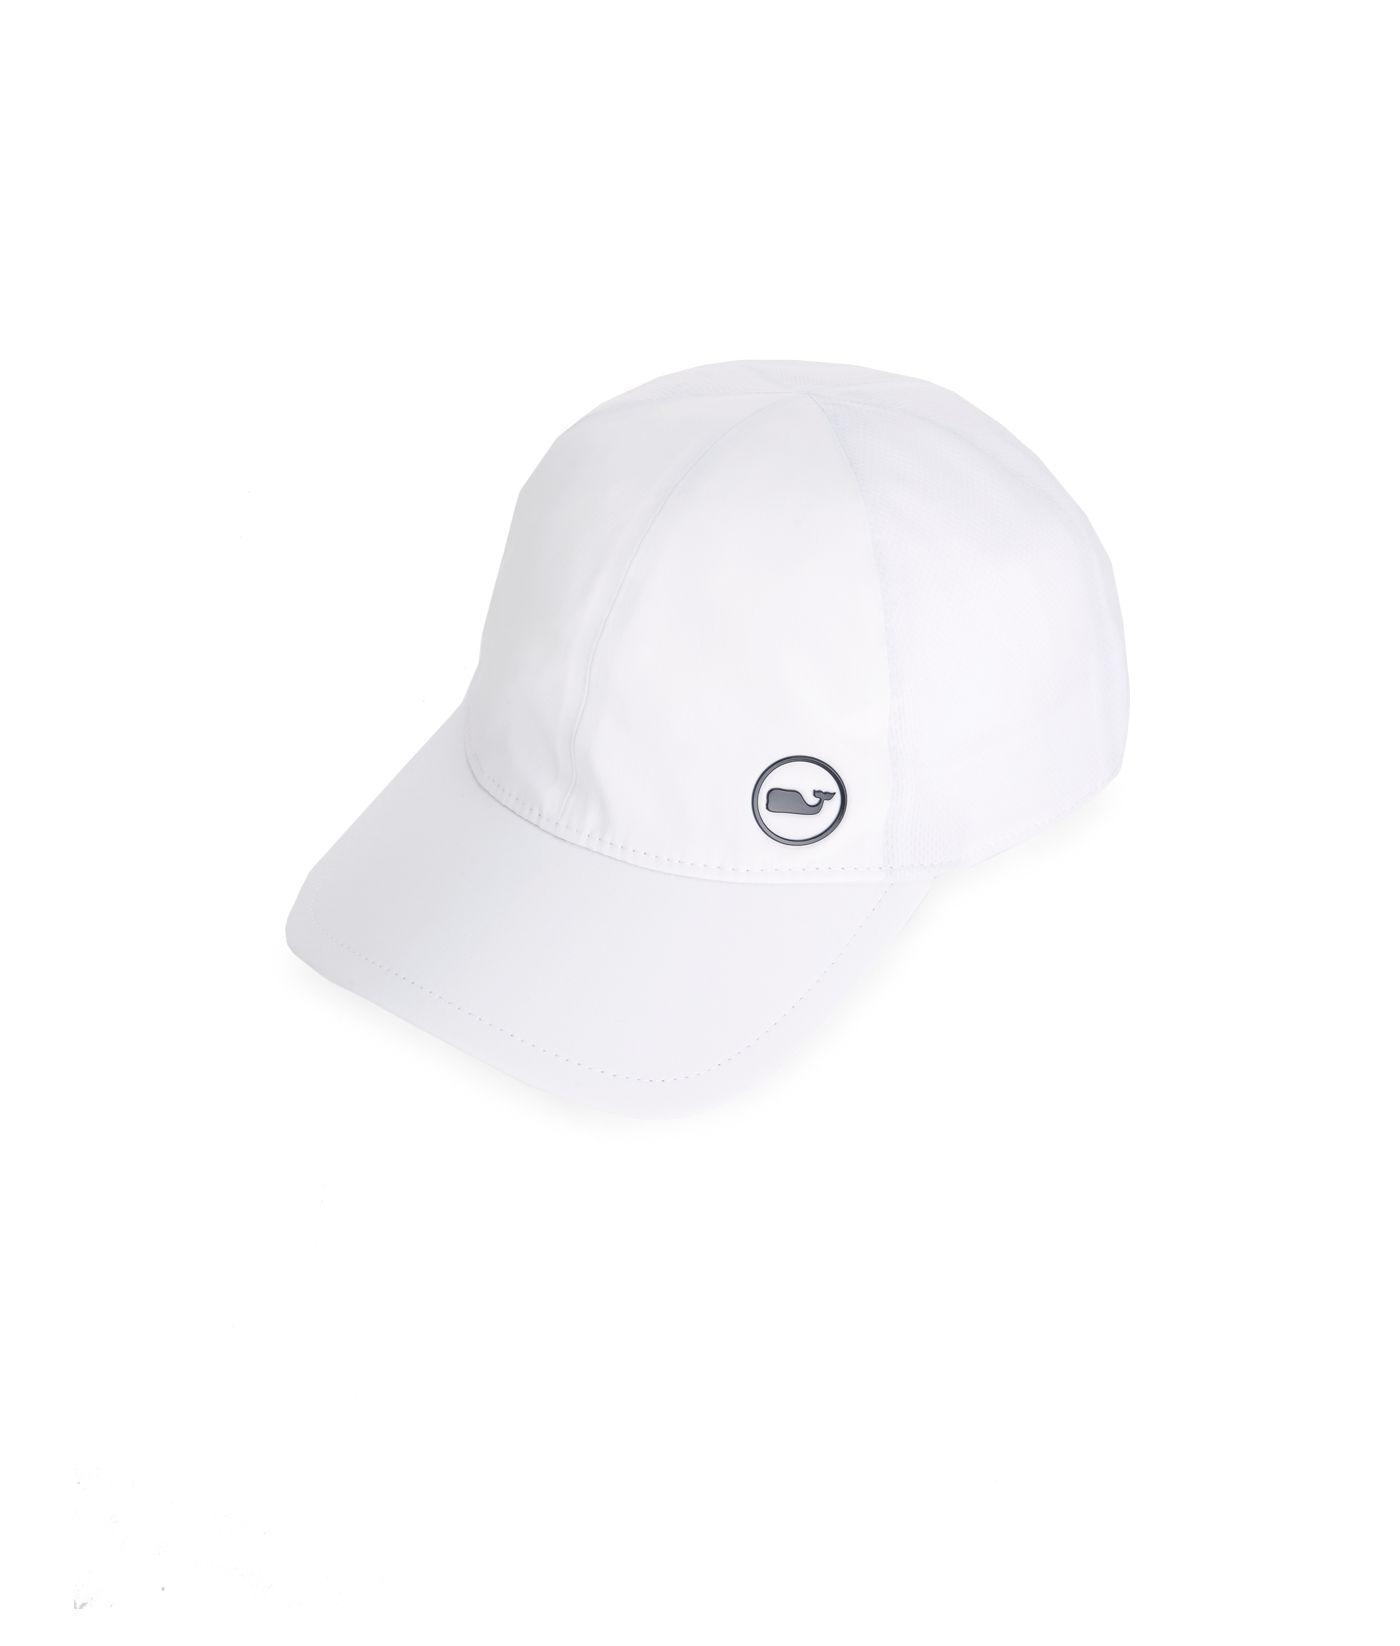 Lyst - Vineyard Vines Performance Mesh Whale Dot Trucker Hat in ... 92113016fdf